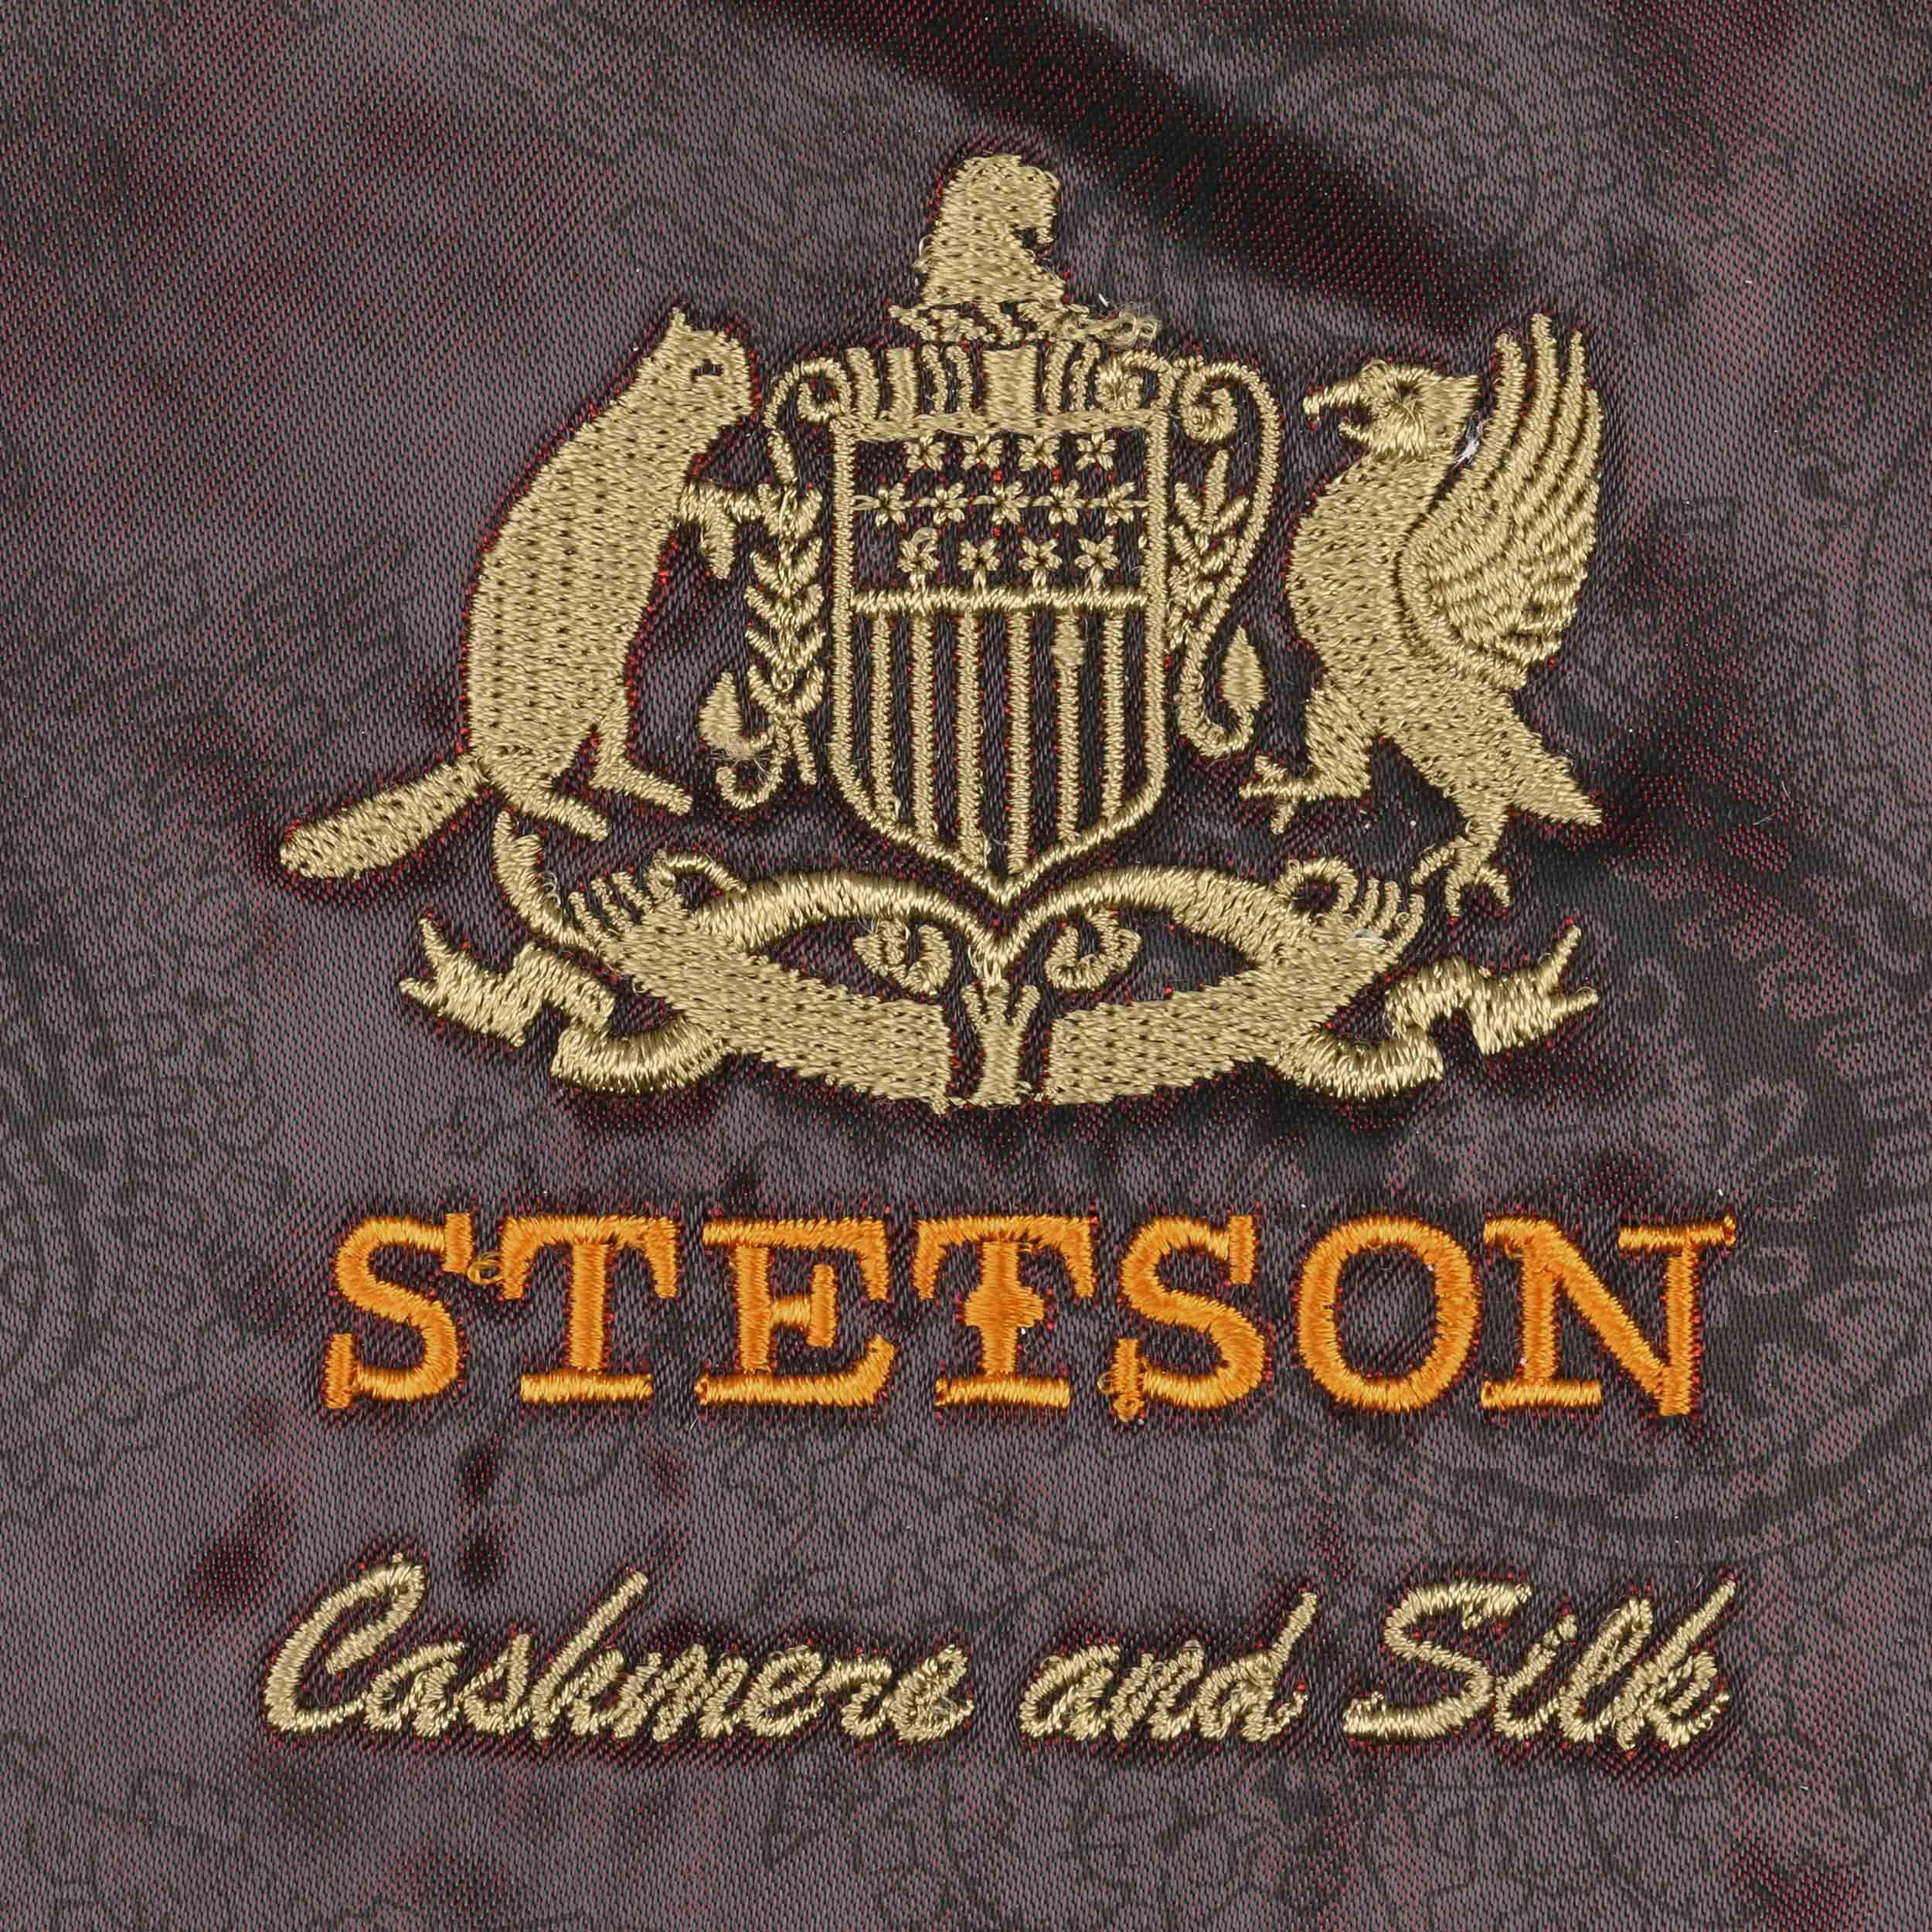 ... Bangor Cashmere Silk Flat Cap by Stetson - beige 5 ... 3f14d73c8754